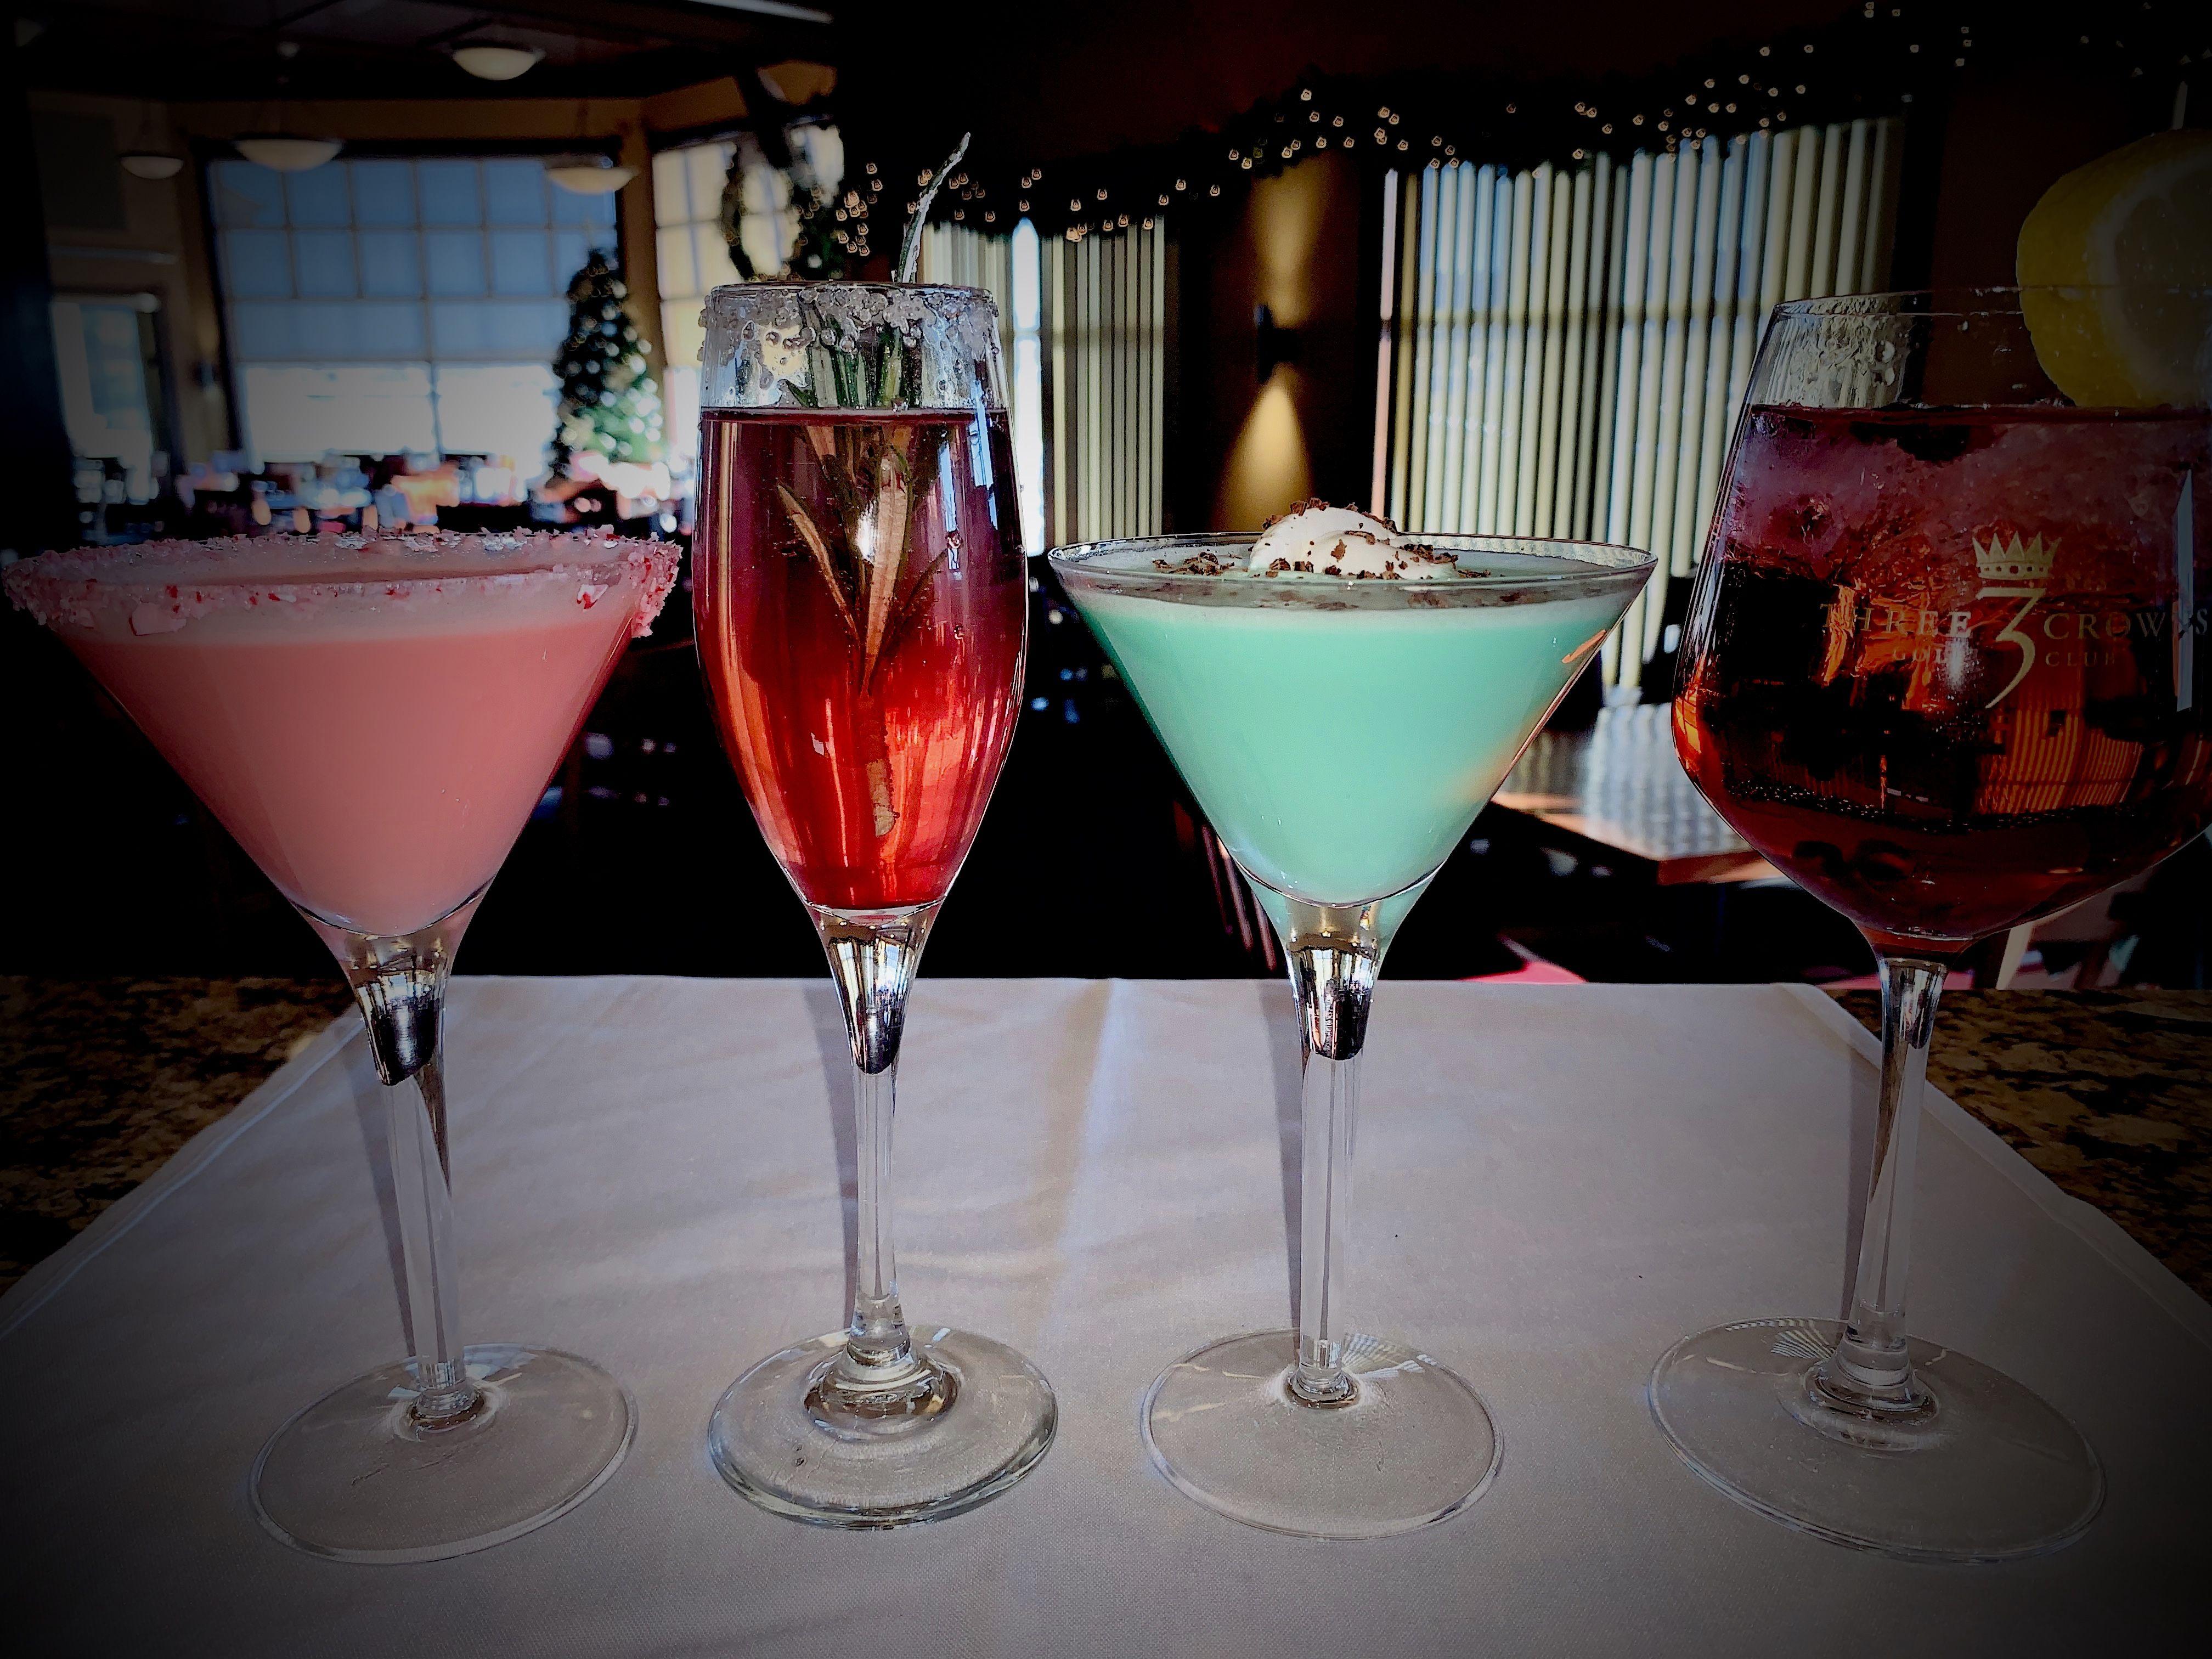 Holiday Drinks at Three Crowns Golf Club in Casper